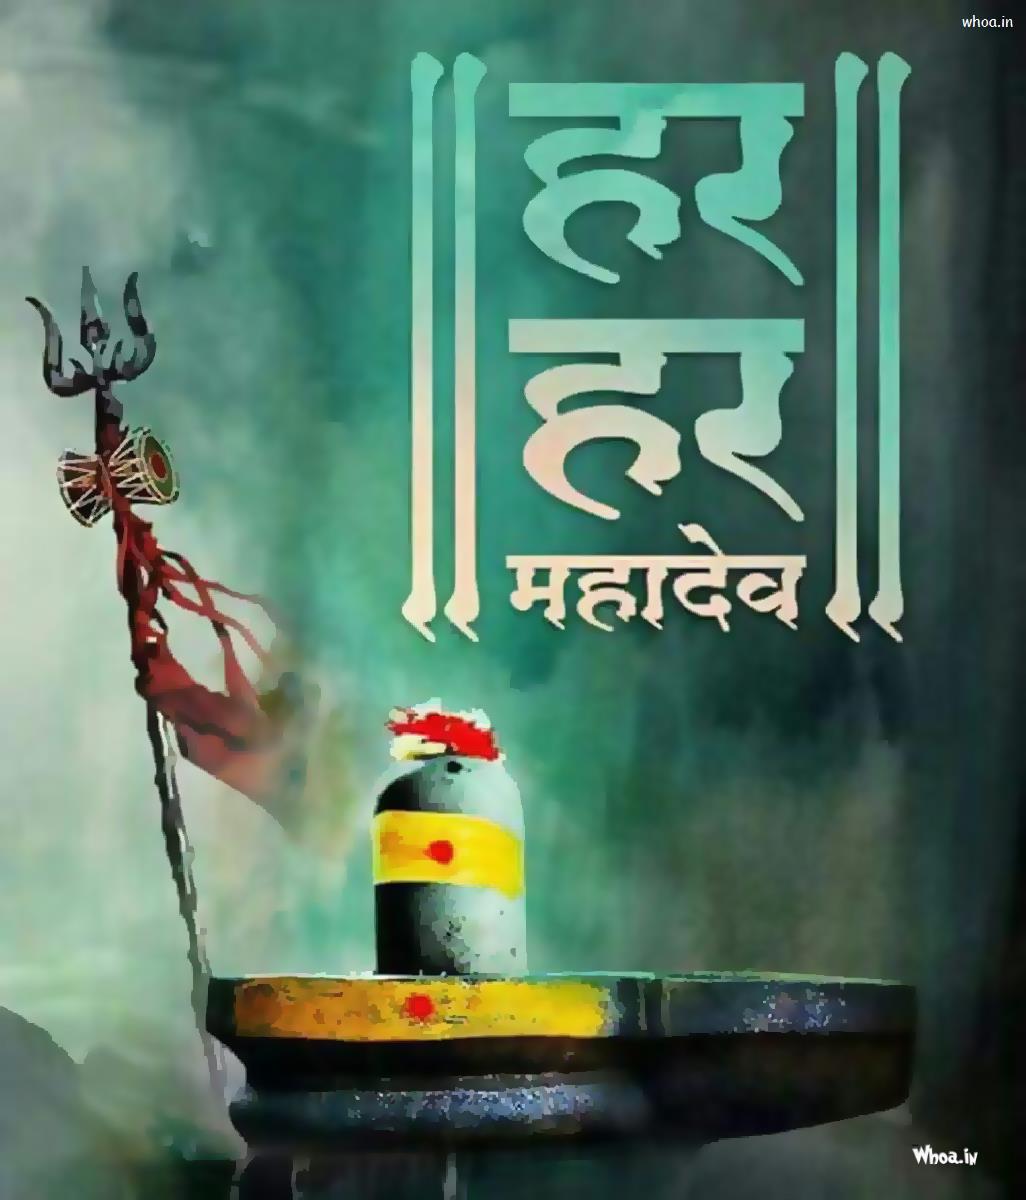 Har Har Mahadev Shivling Lingam Art Colorful Image